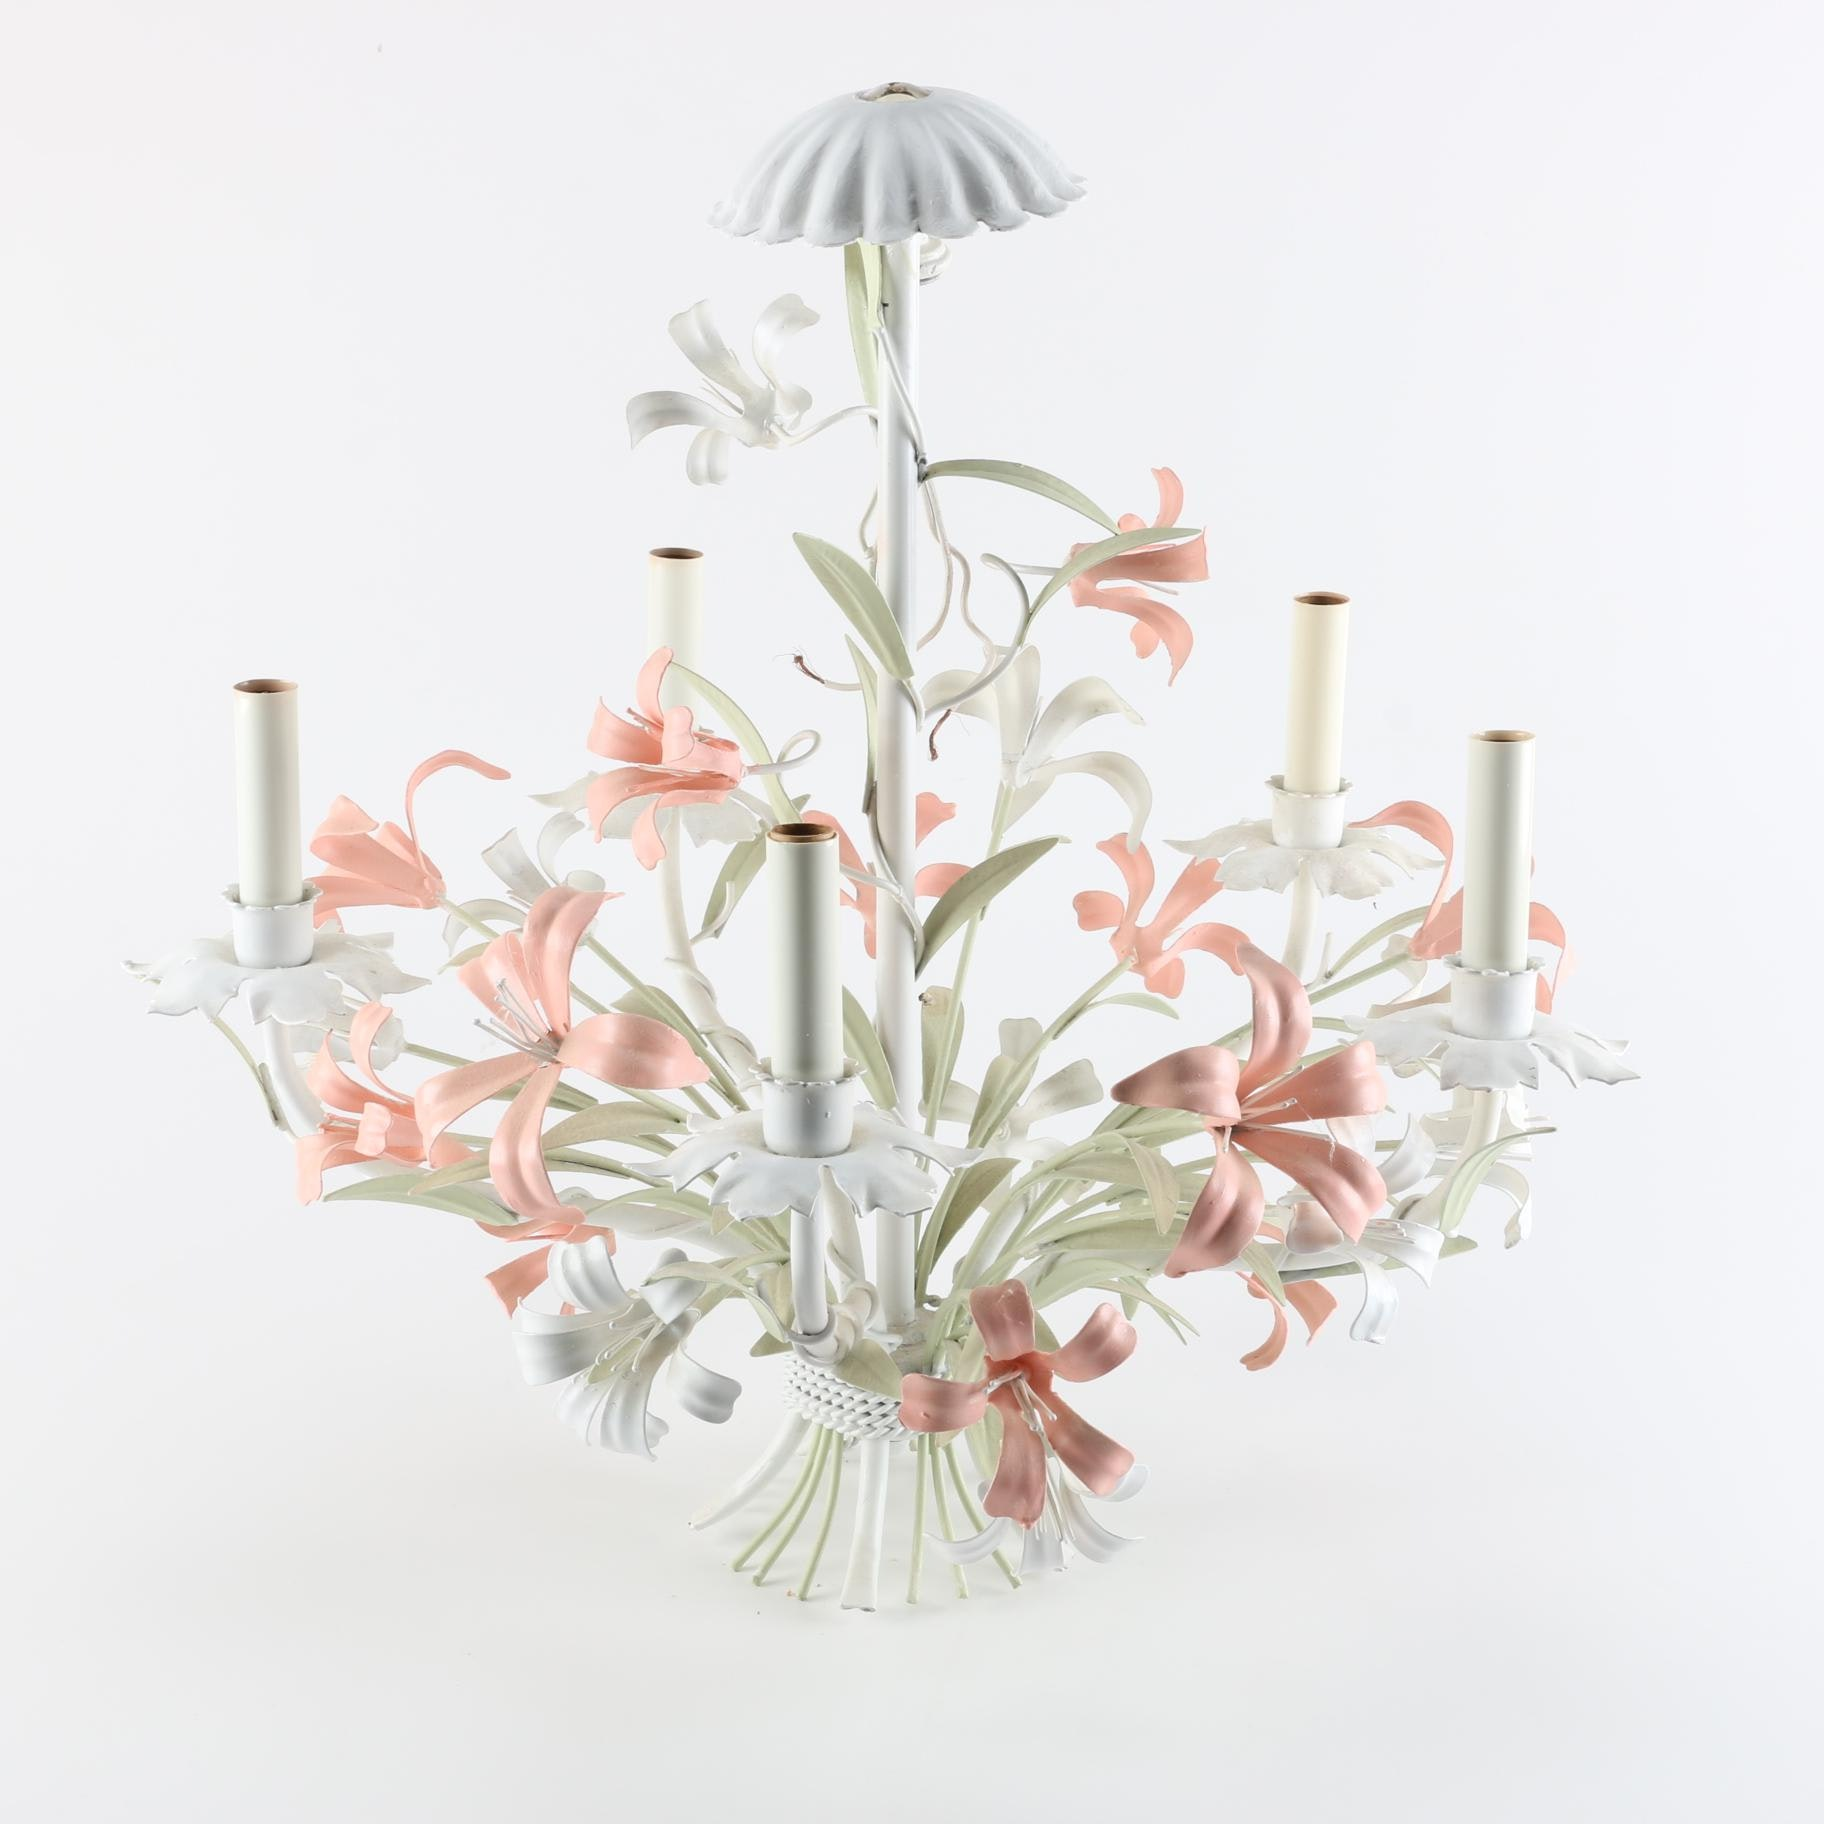 Floral Light Fixture